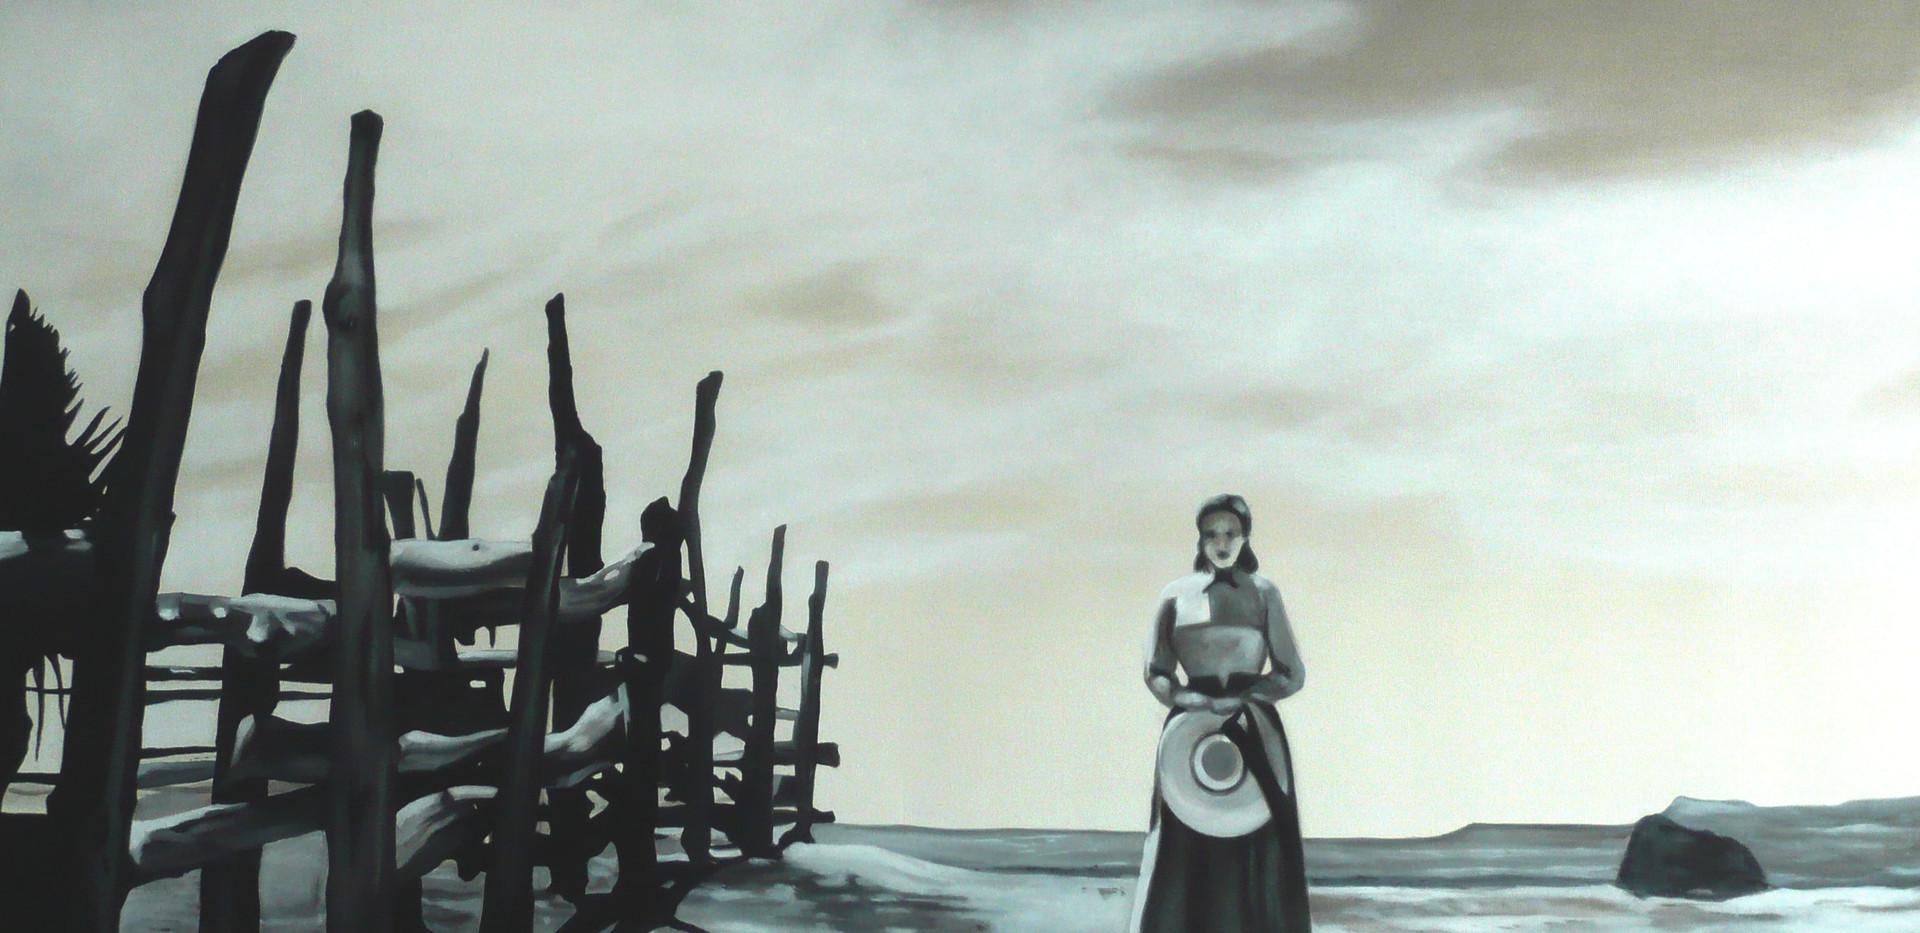 My darling Clementine, John Ford. . scène finale